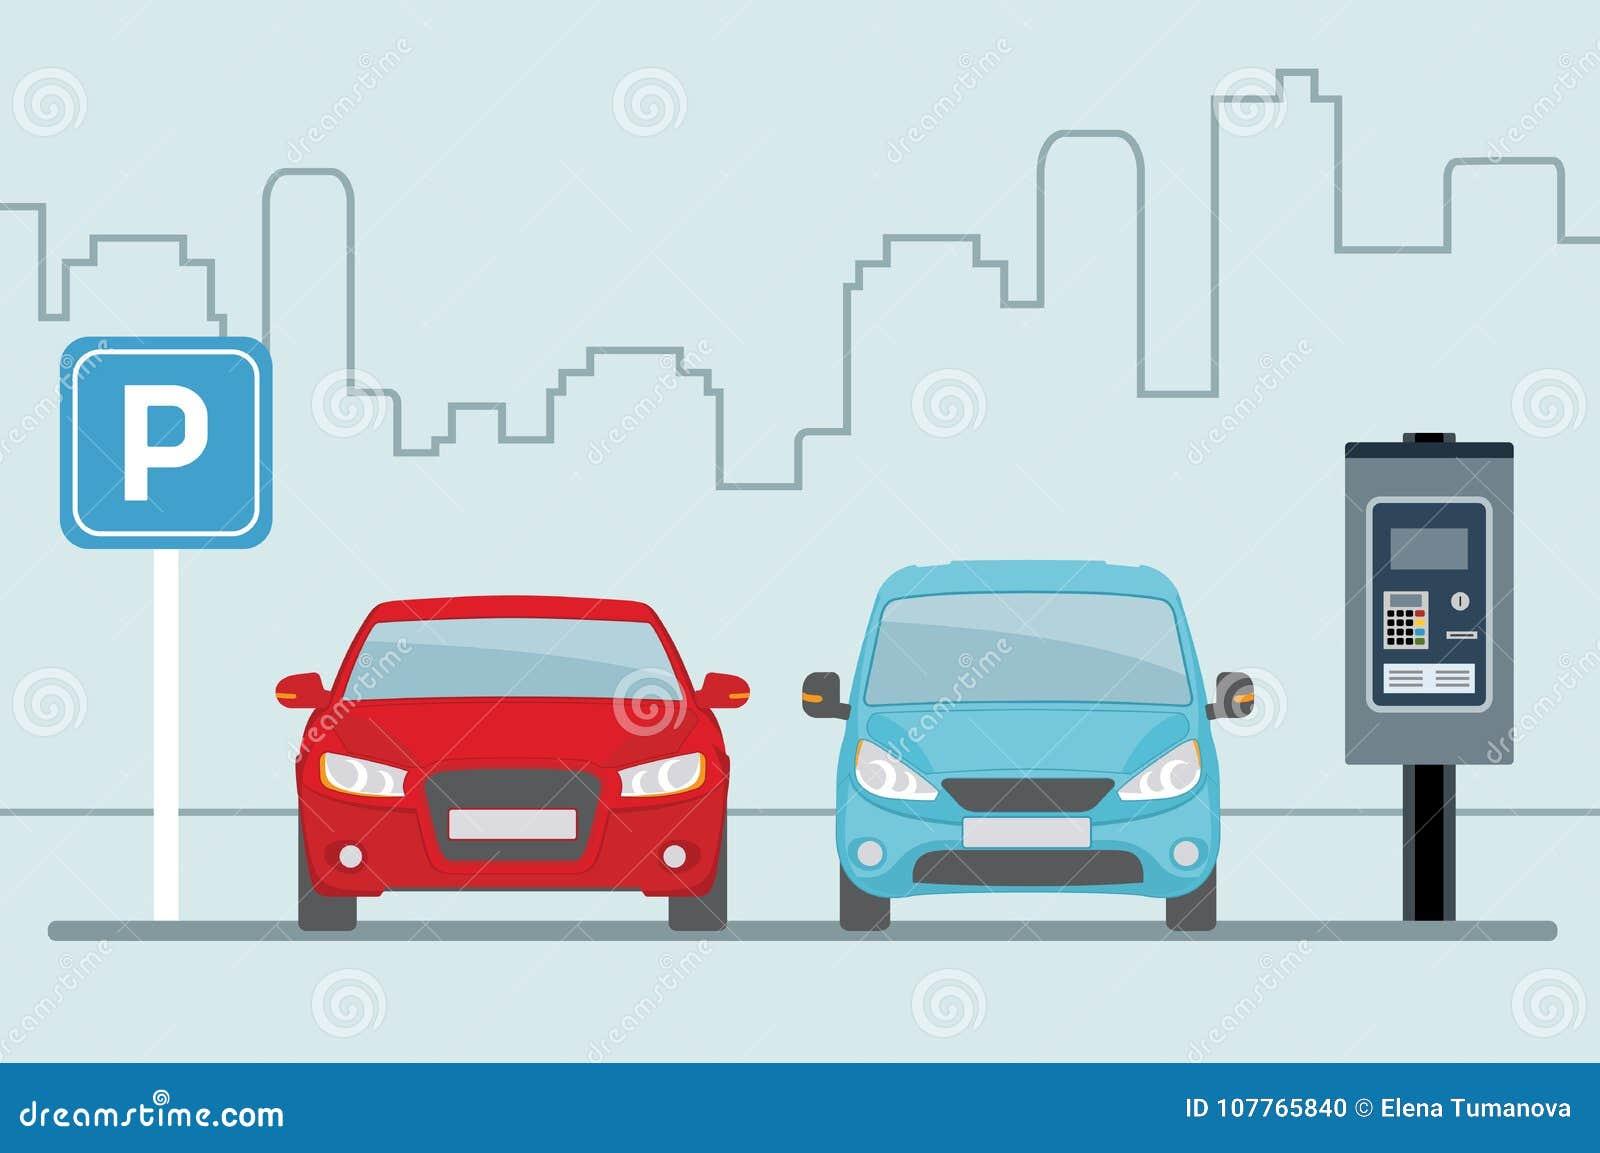 Parking Stock Illustrations - 15,698 Parking Stock ...